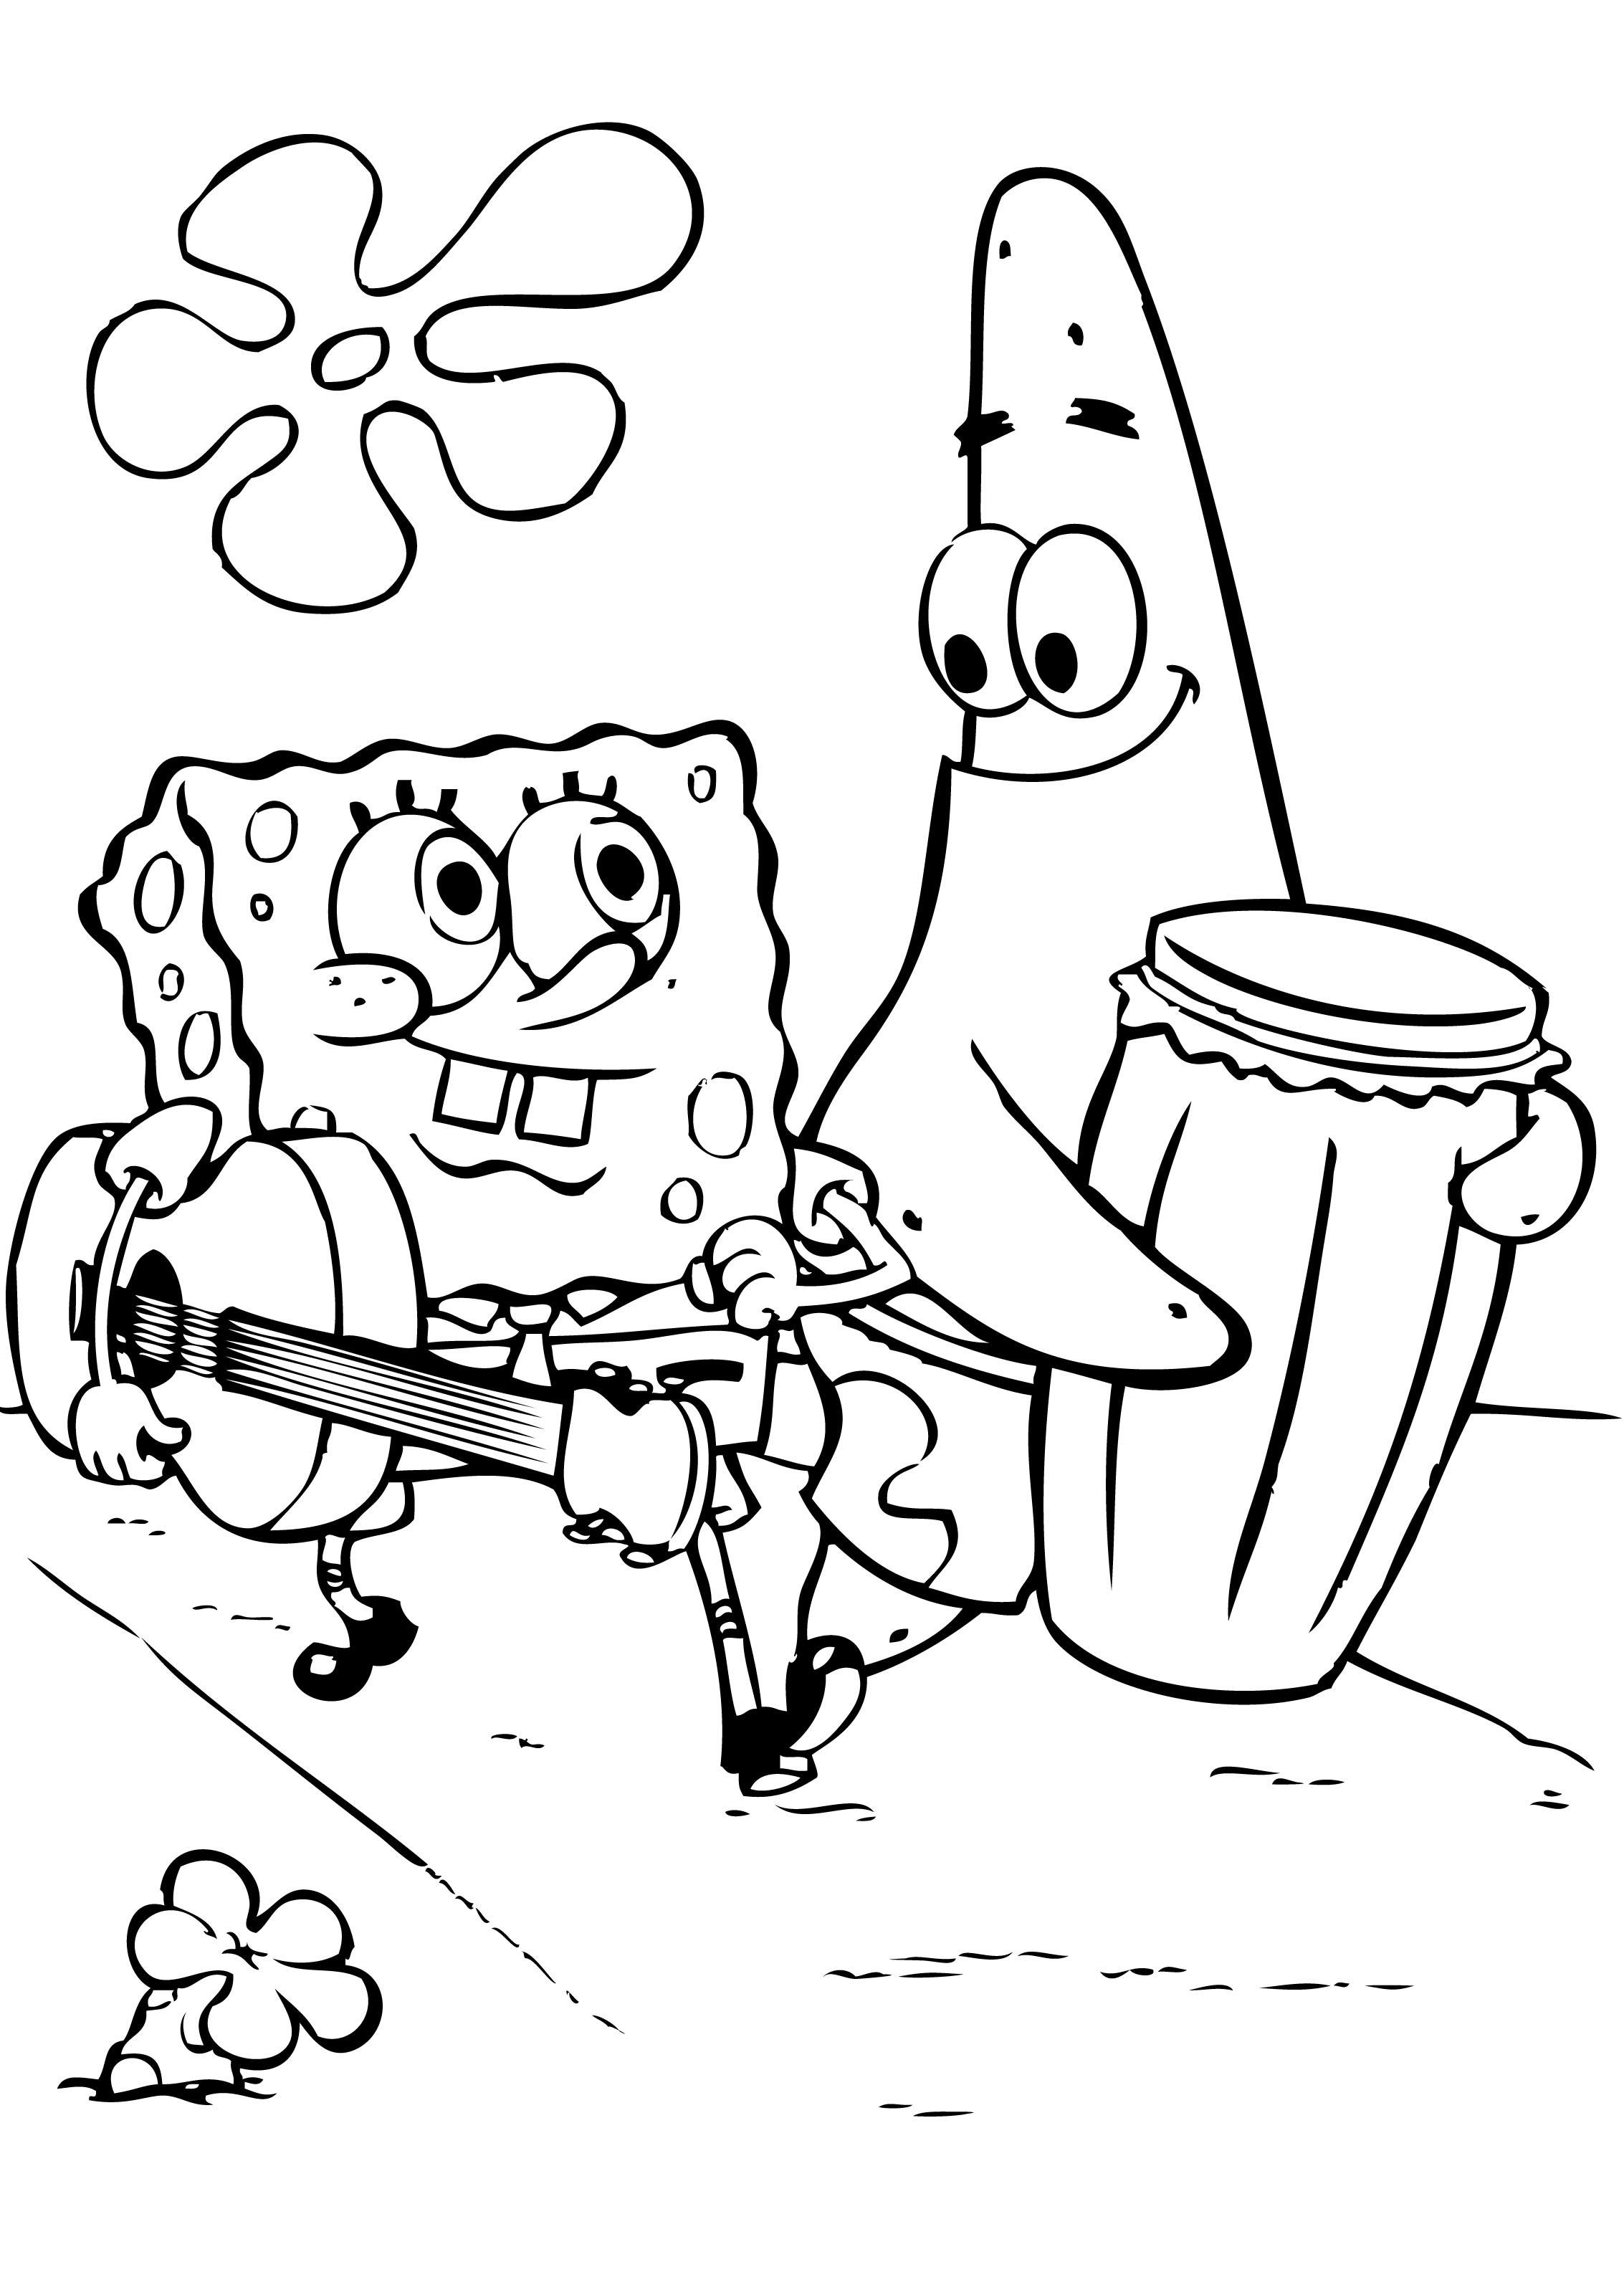 Coloring pages to print spongebob - Spongebob And Patrick Coloring Pages To Print Coloring Kids